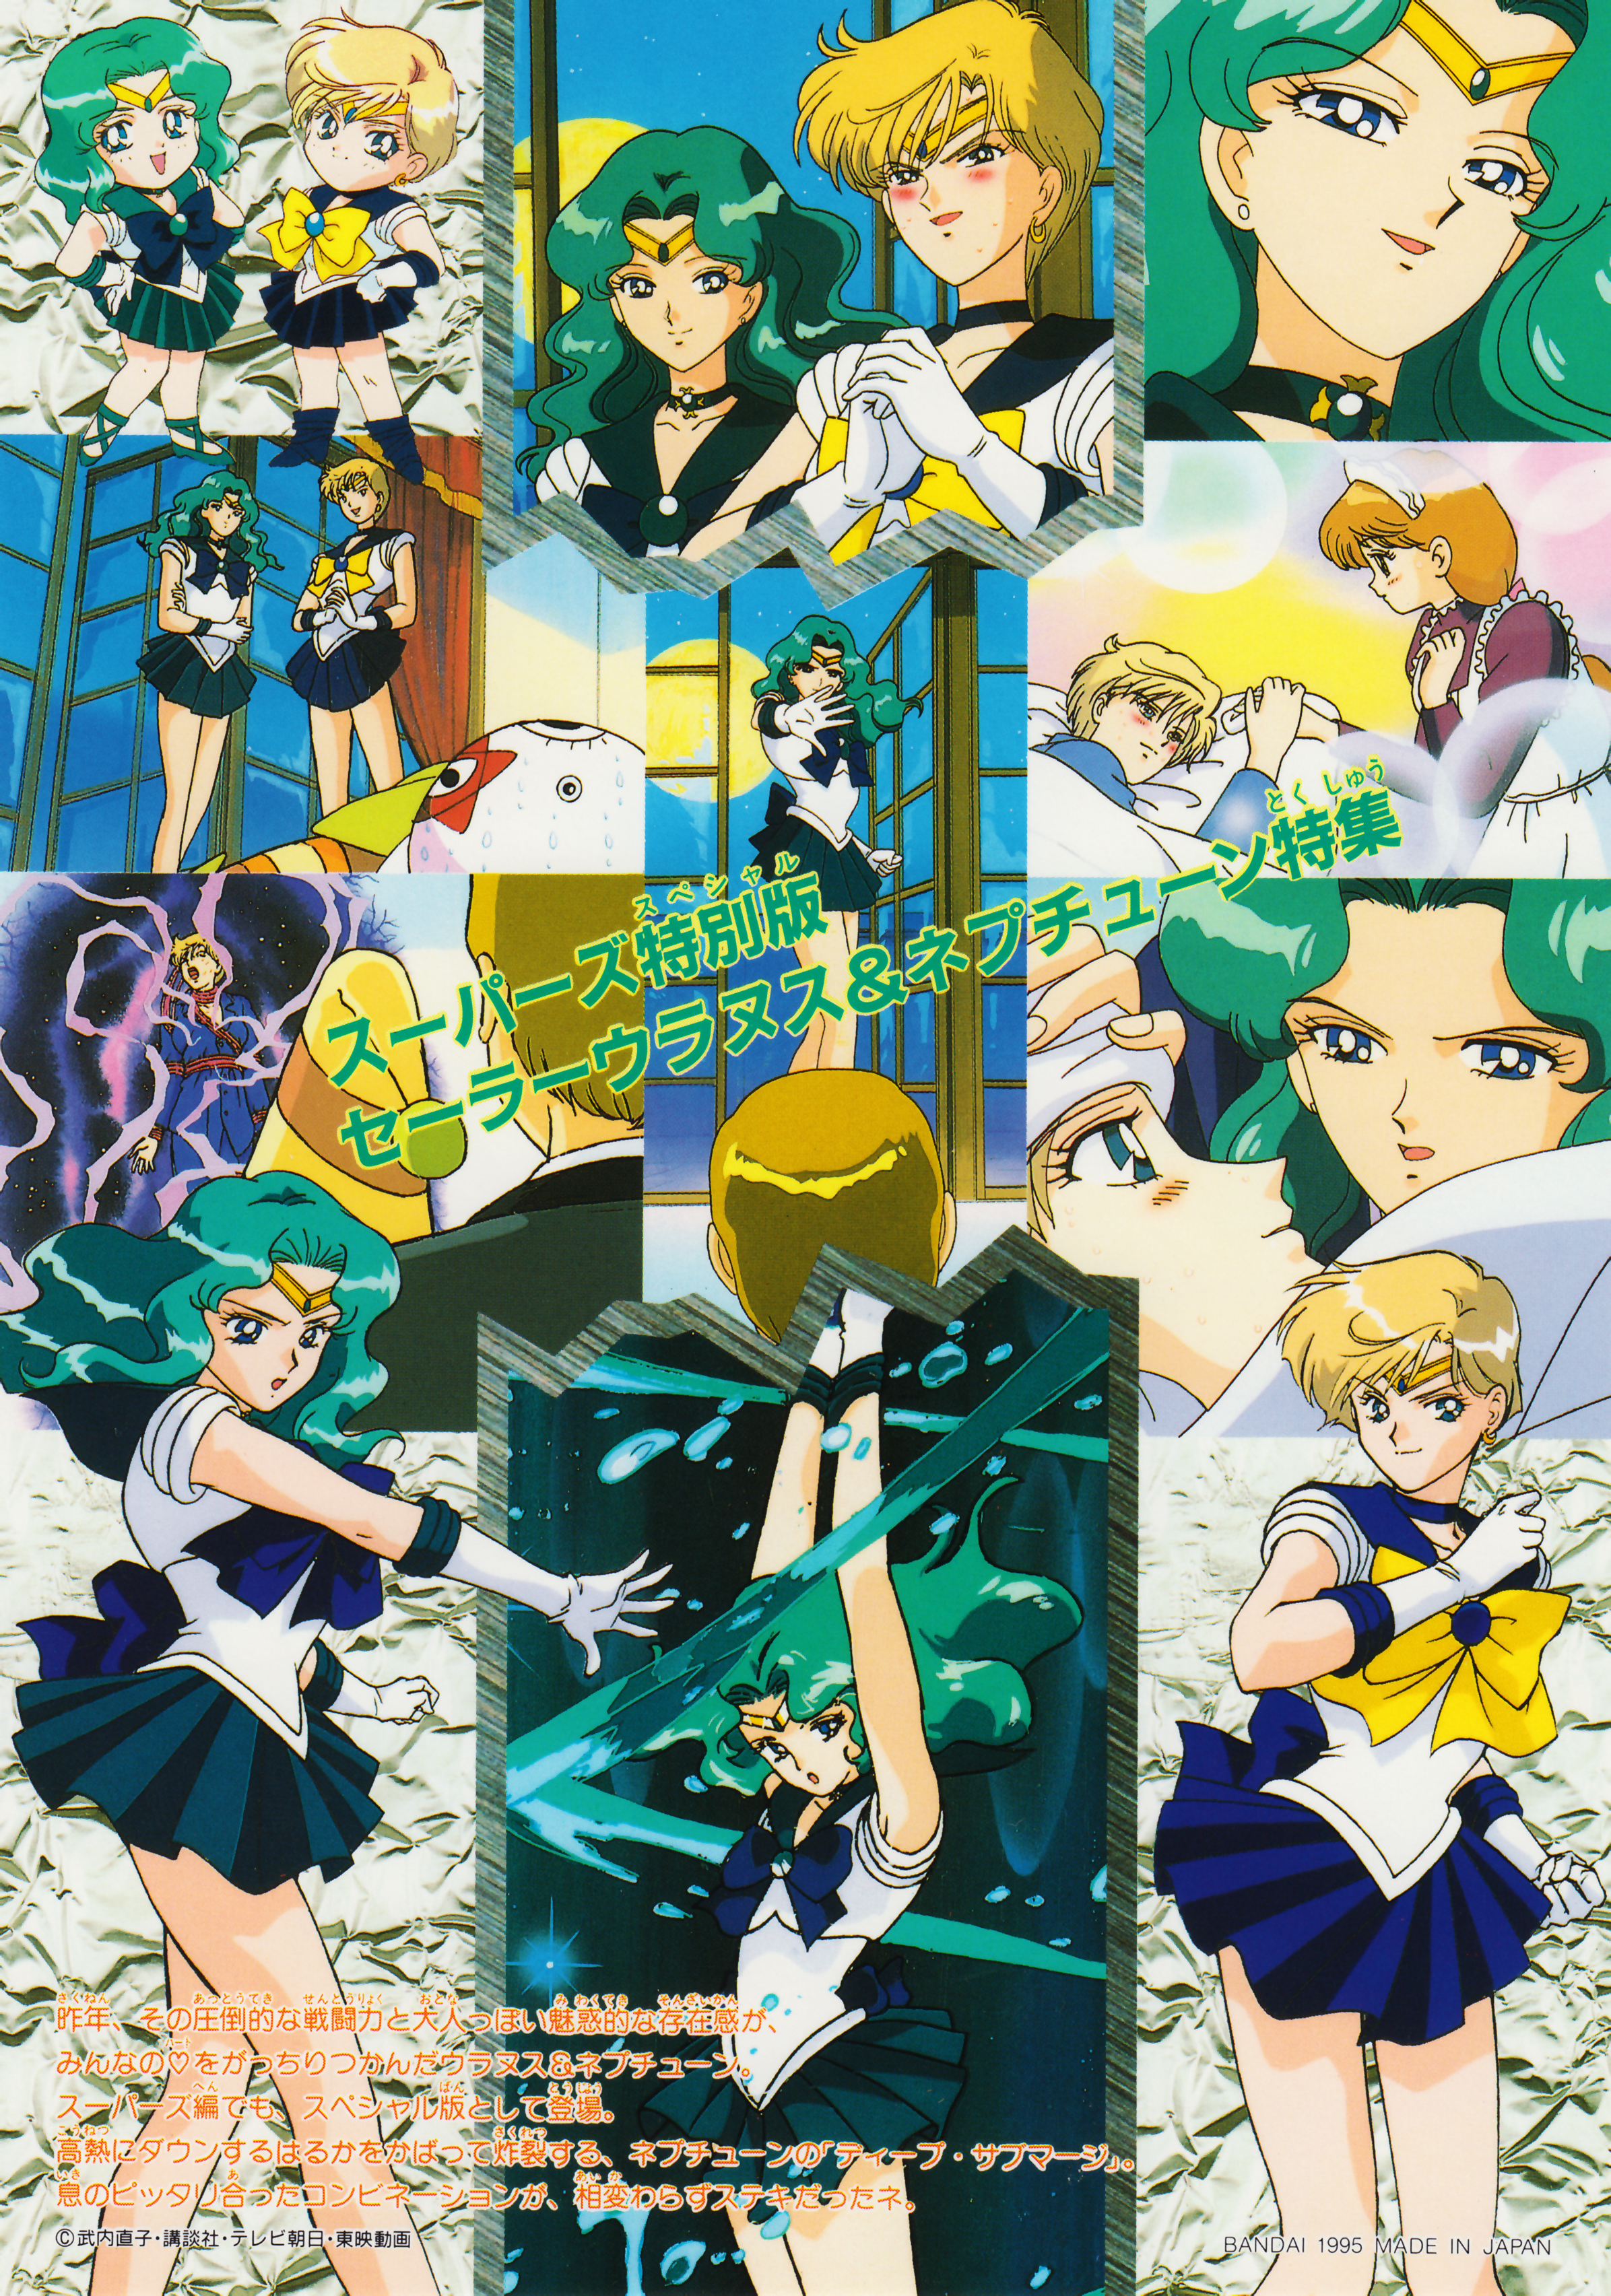 Sailor-moon-supers-jumbo-carddass-3-04b